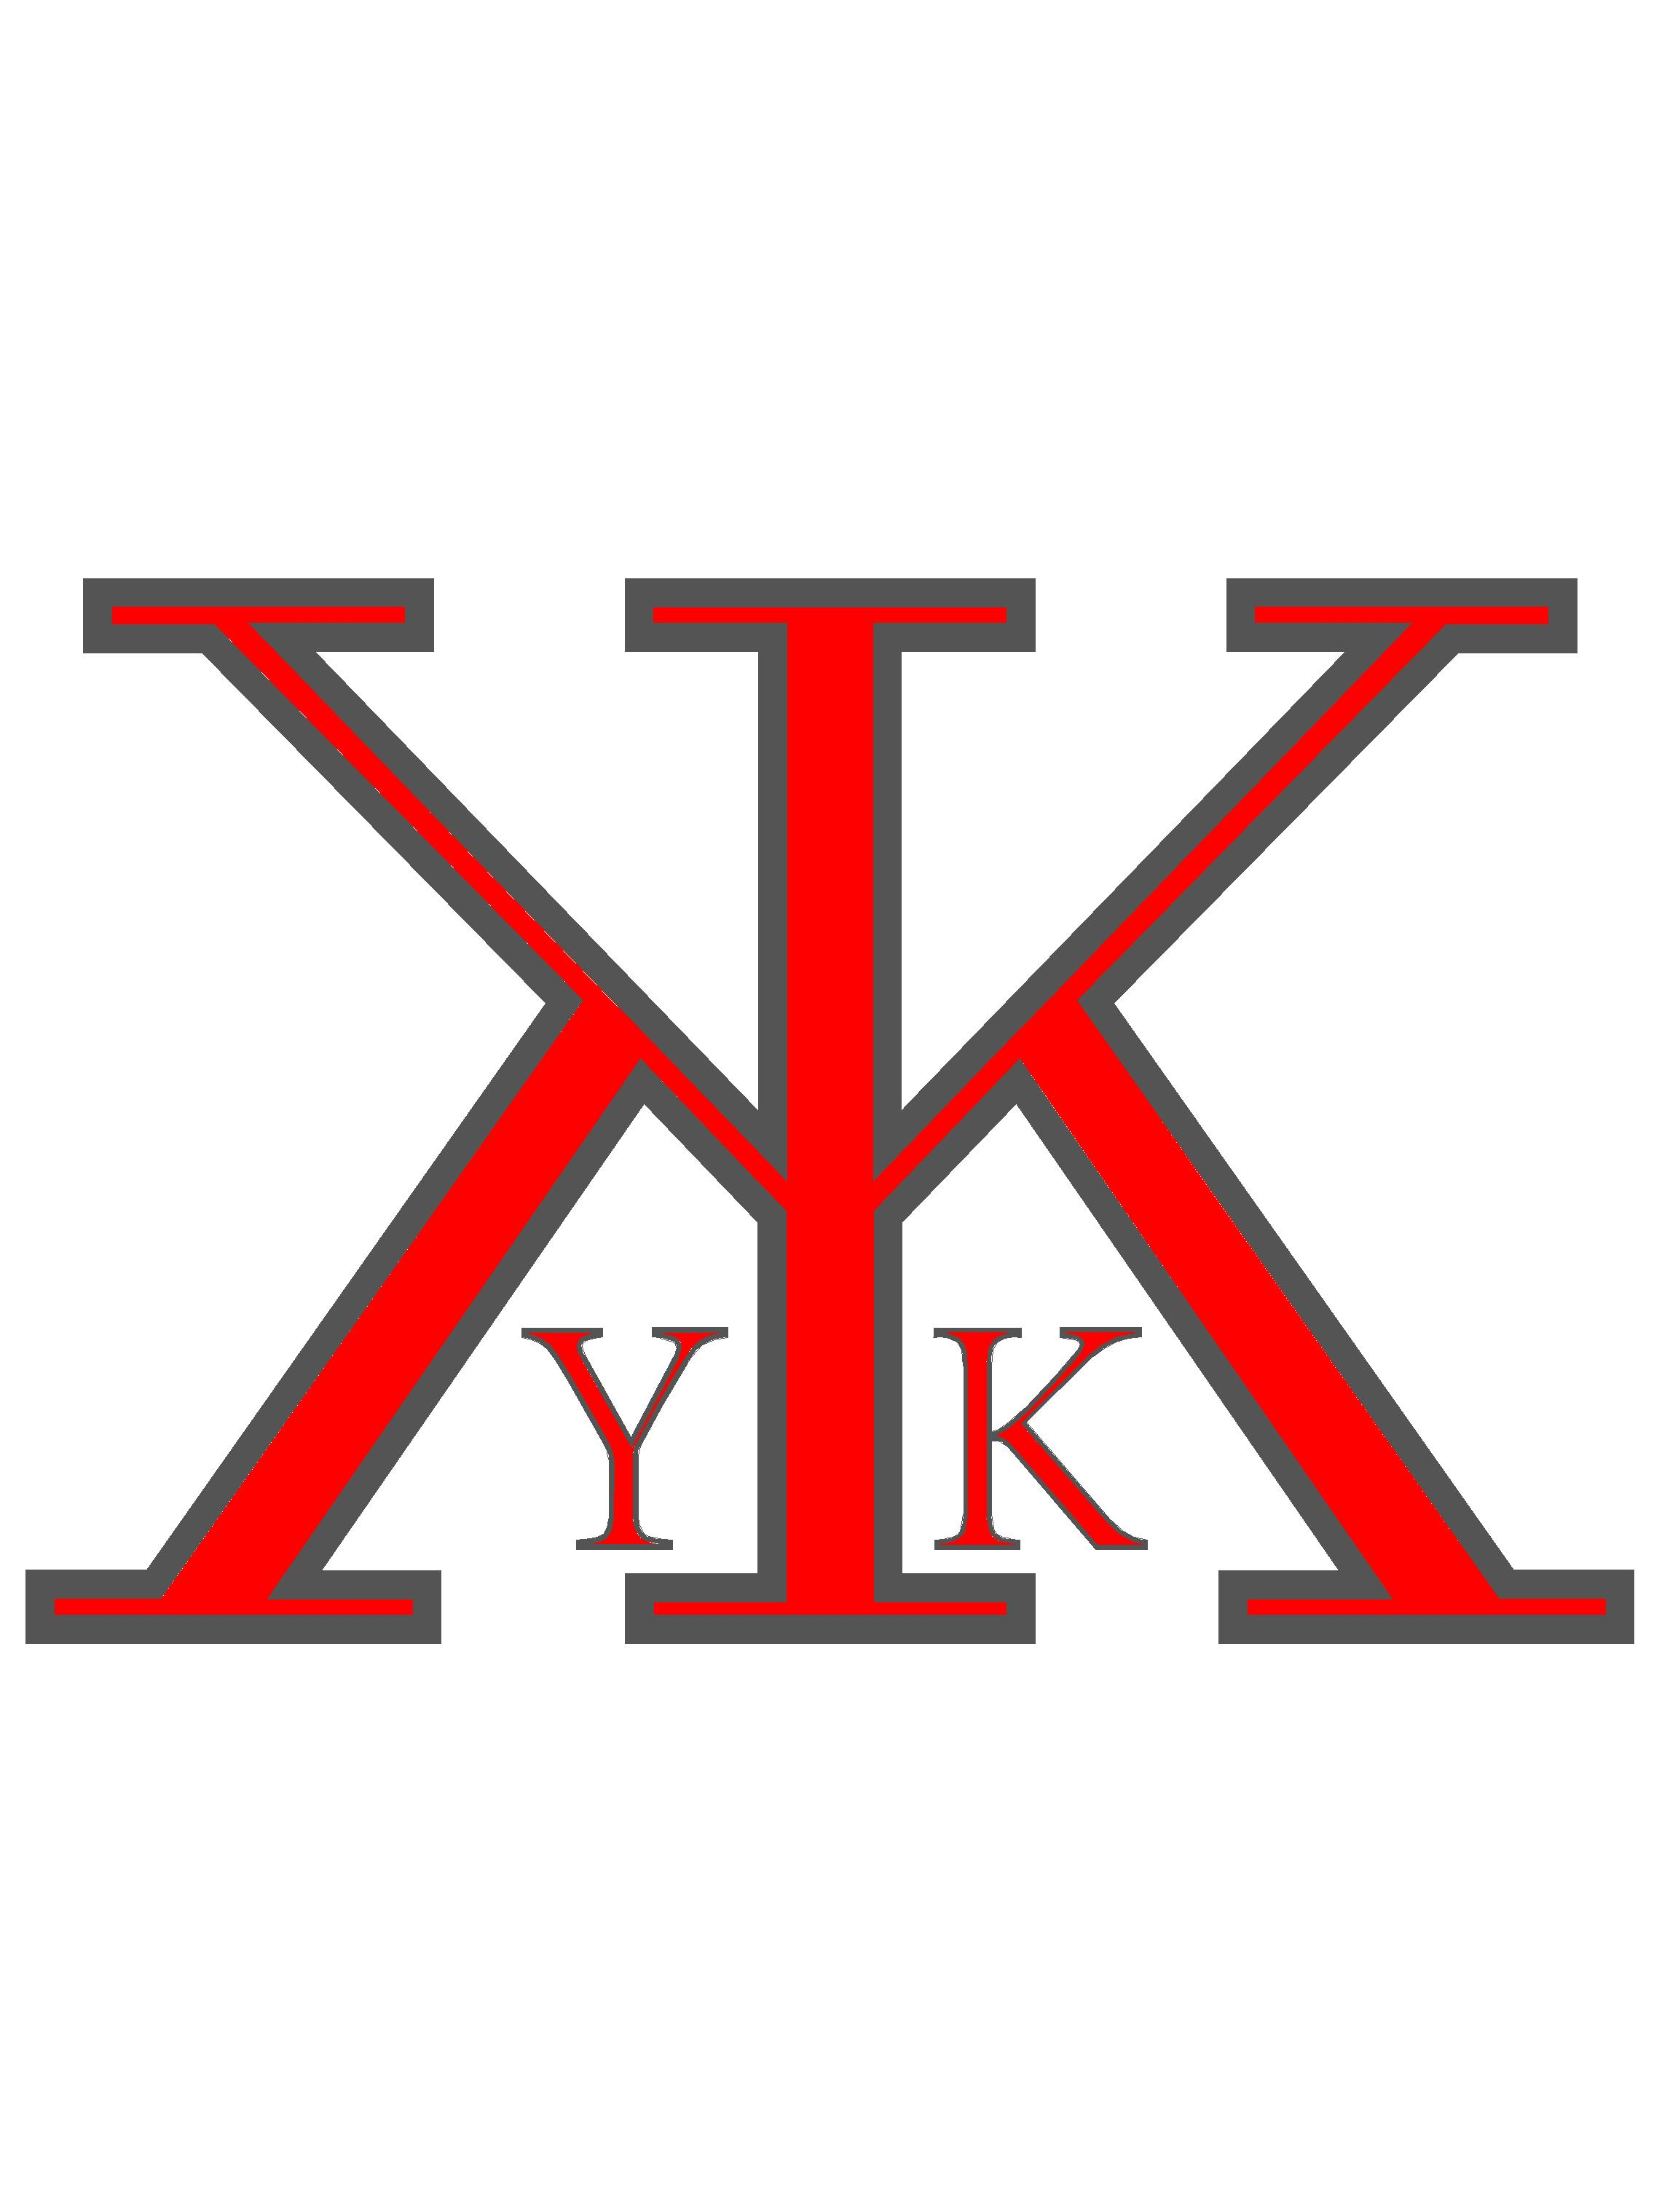 Нужен логотип (эмблема) для самодельного квадроцикла фото f_7115afd2994d1513.jpg